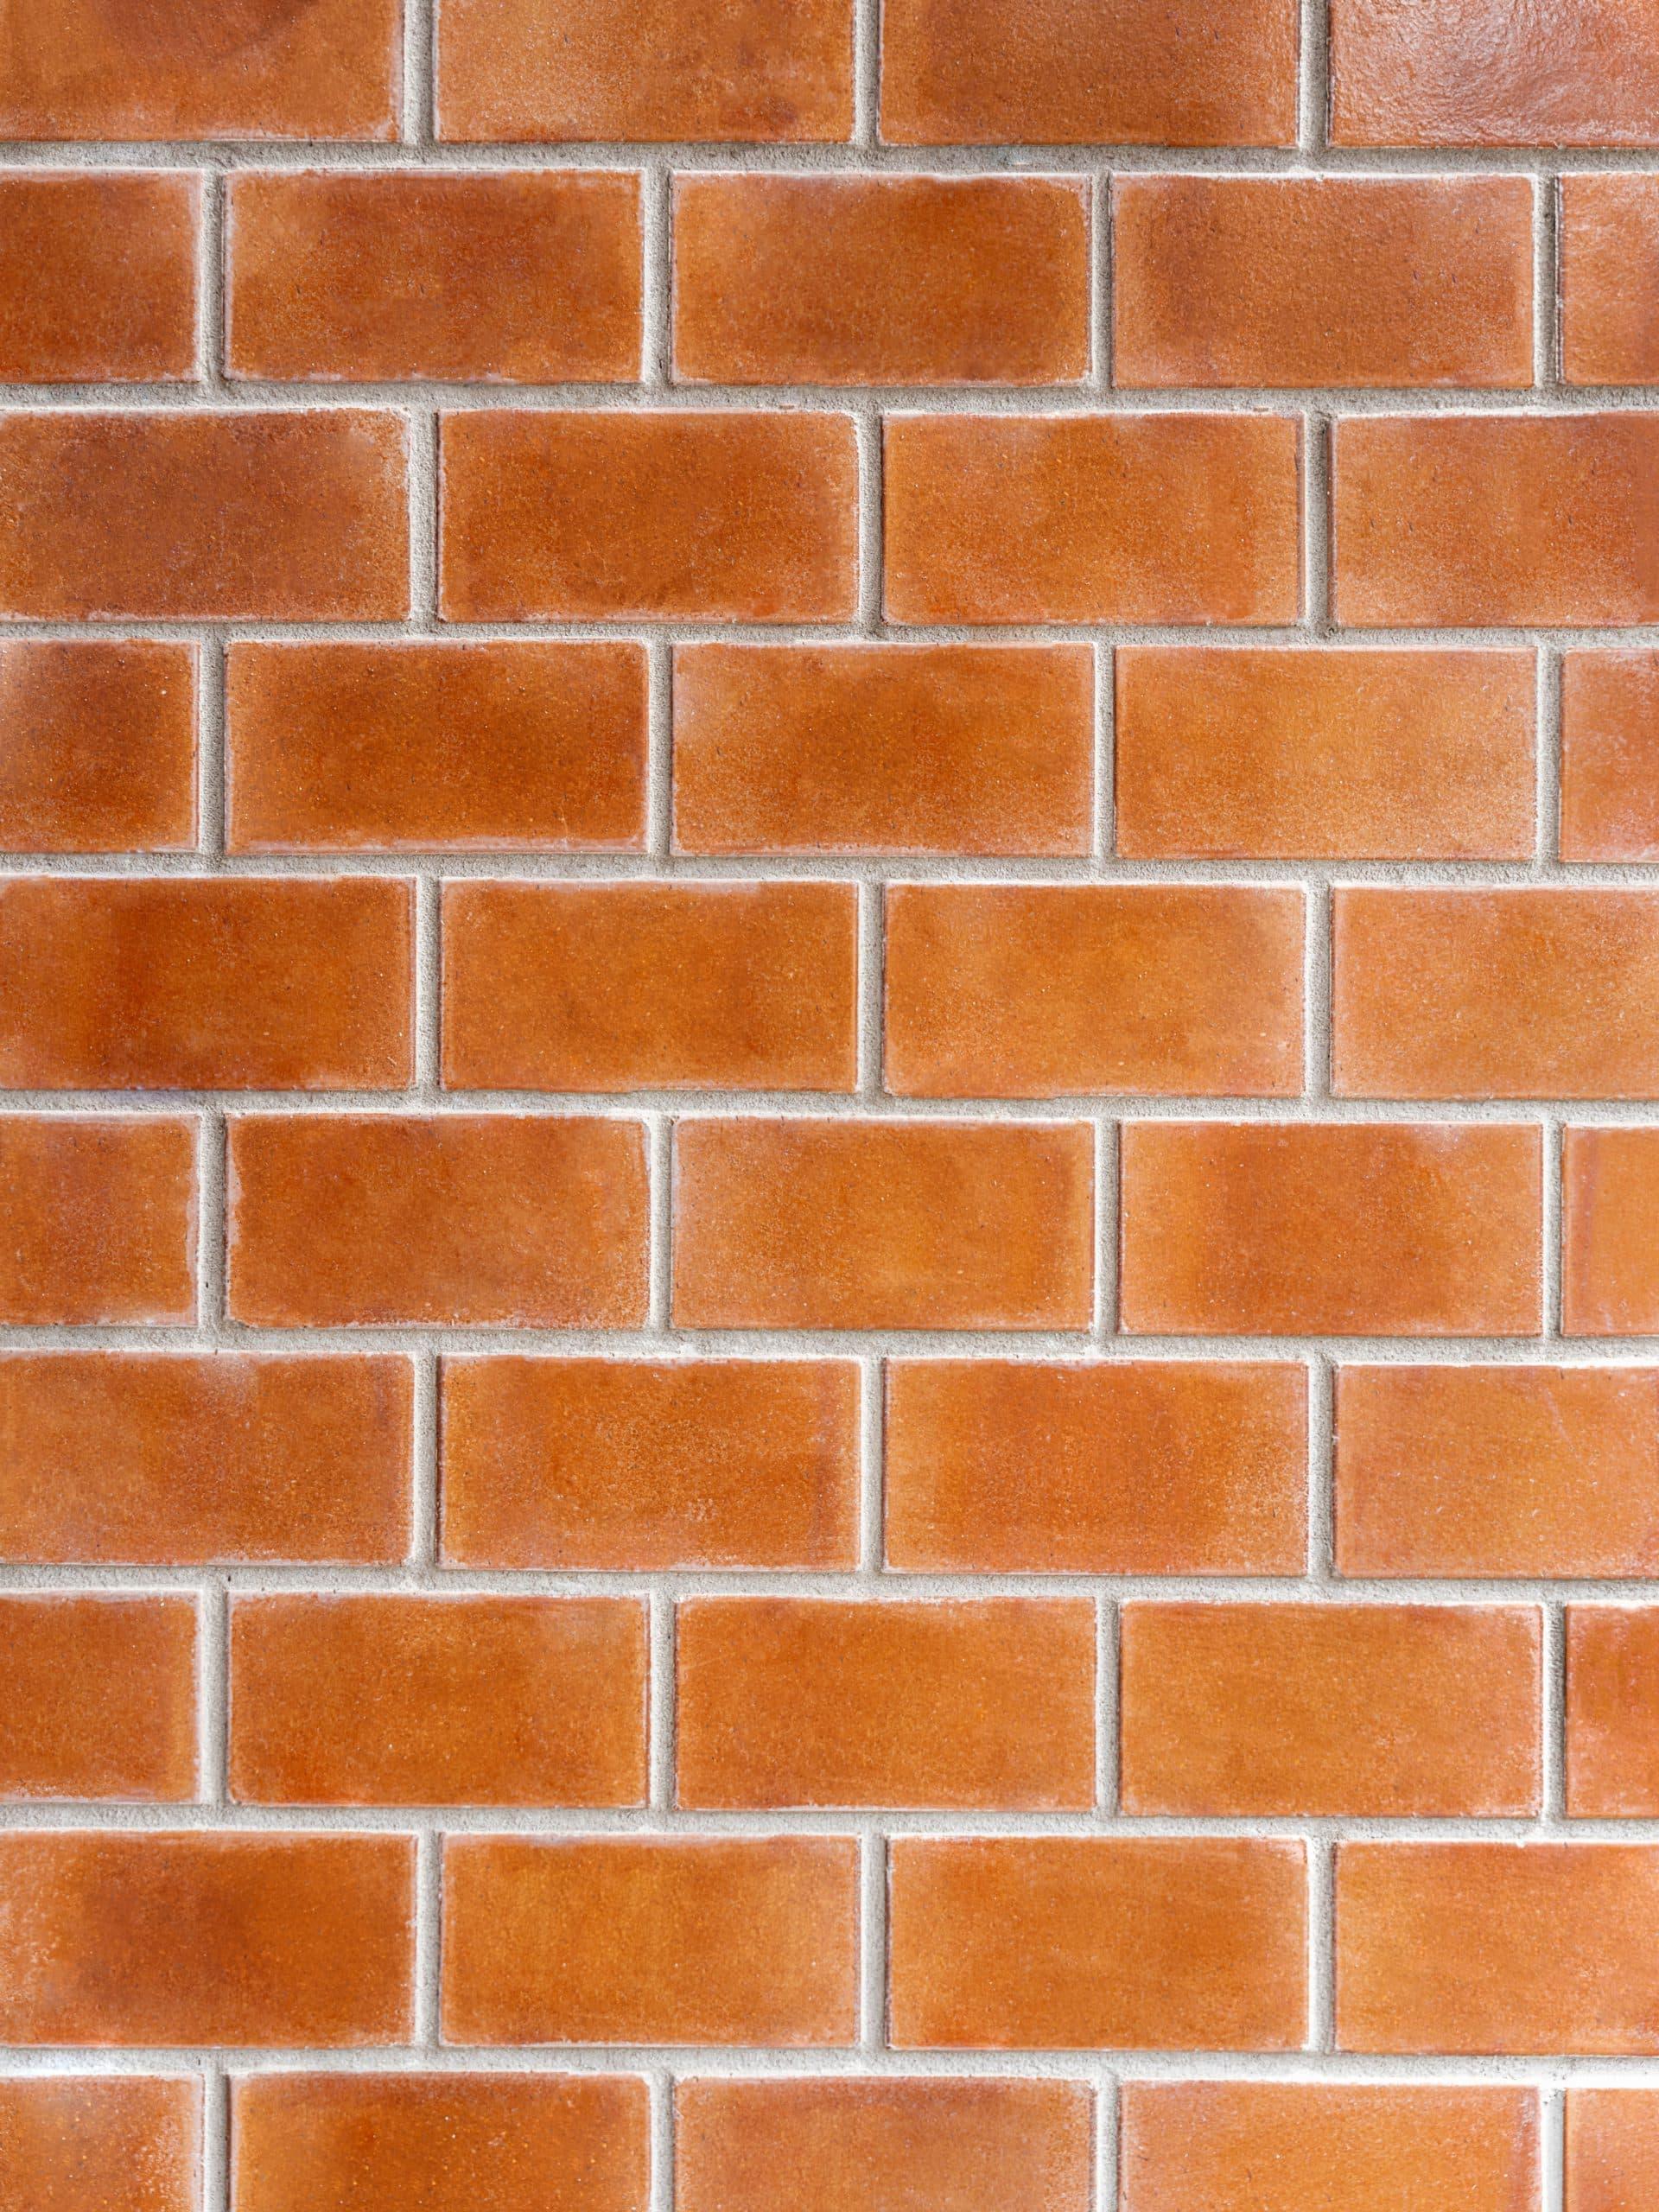 britloft-wall (1)